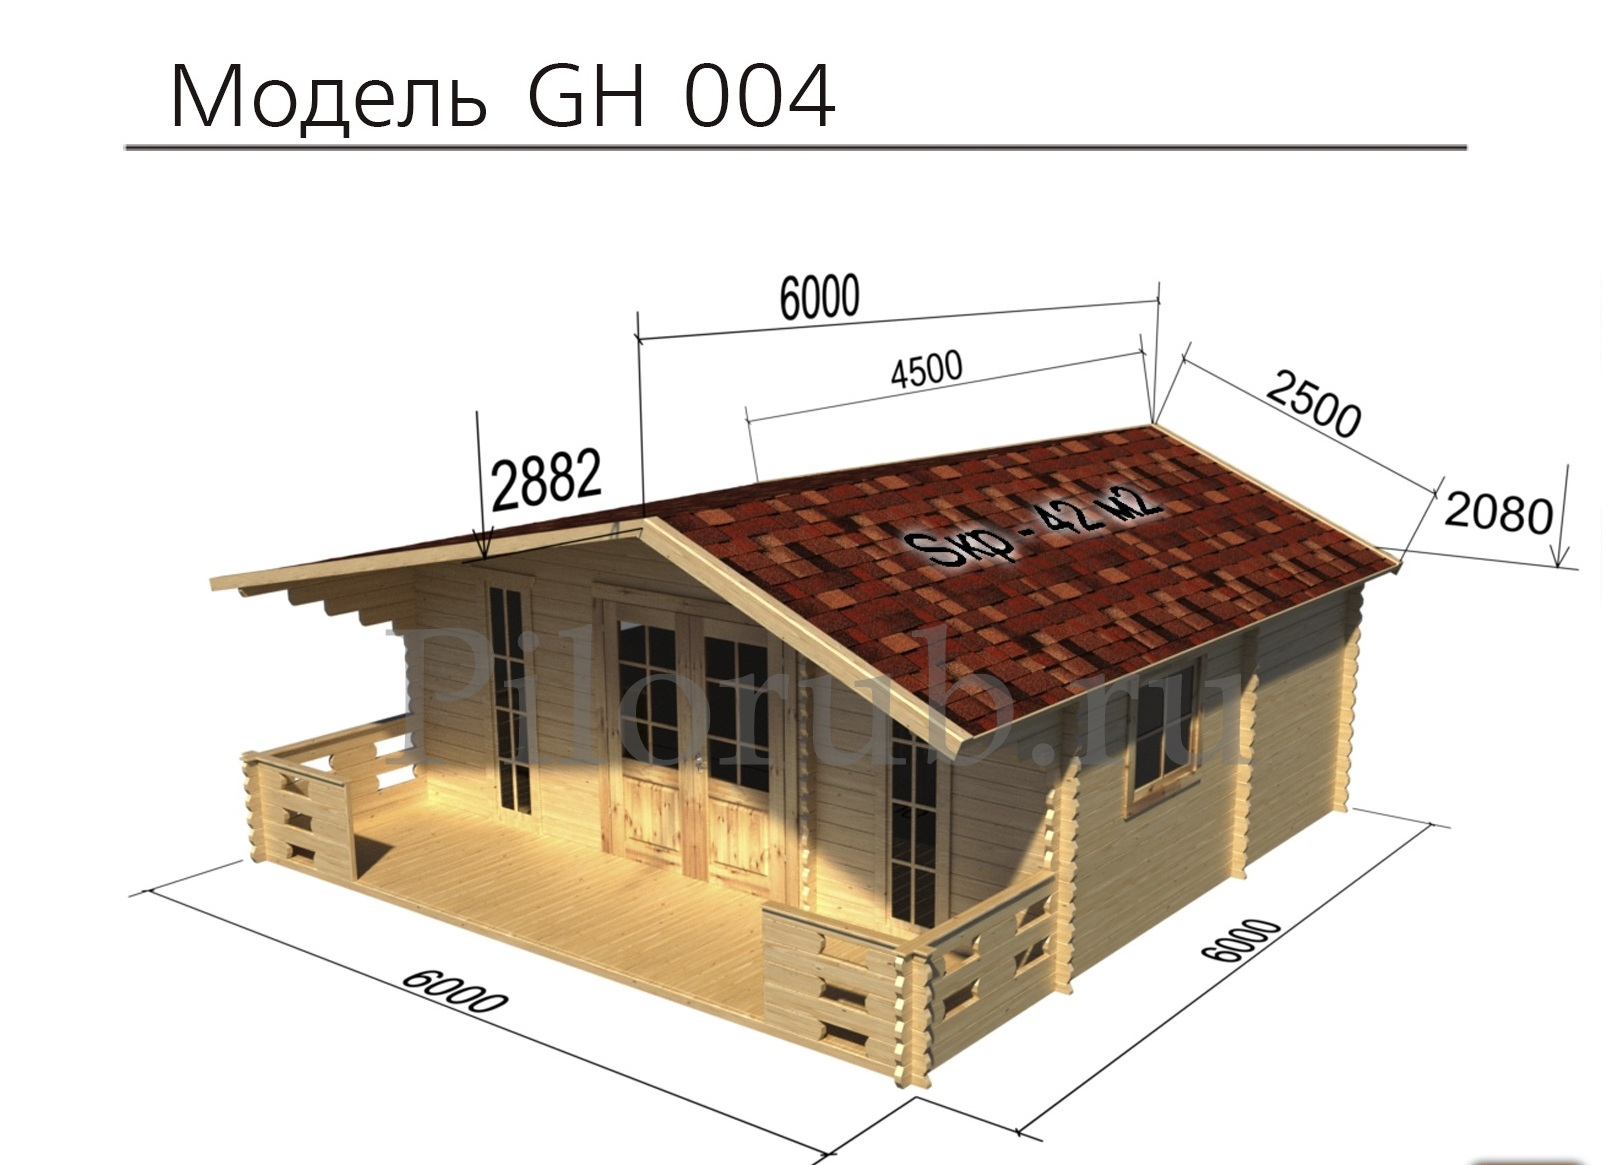 GH004